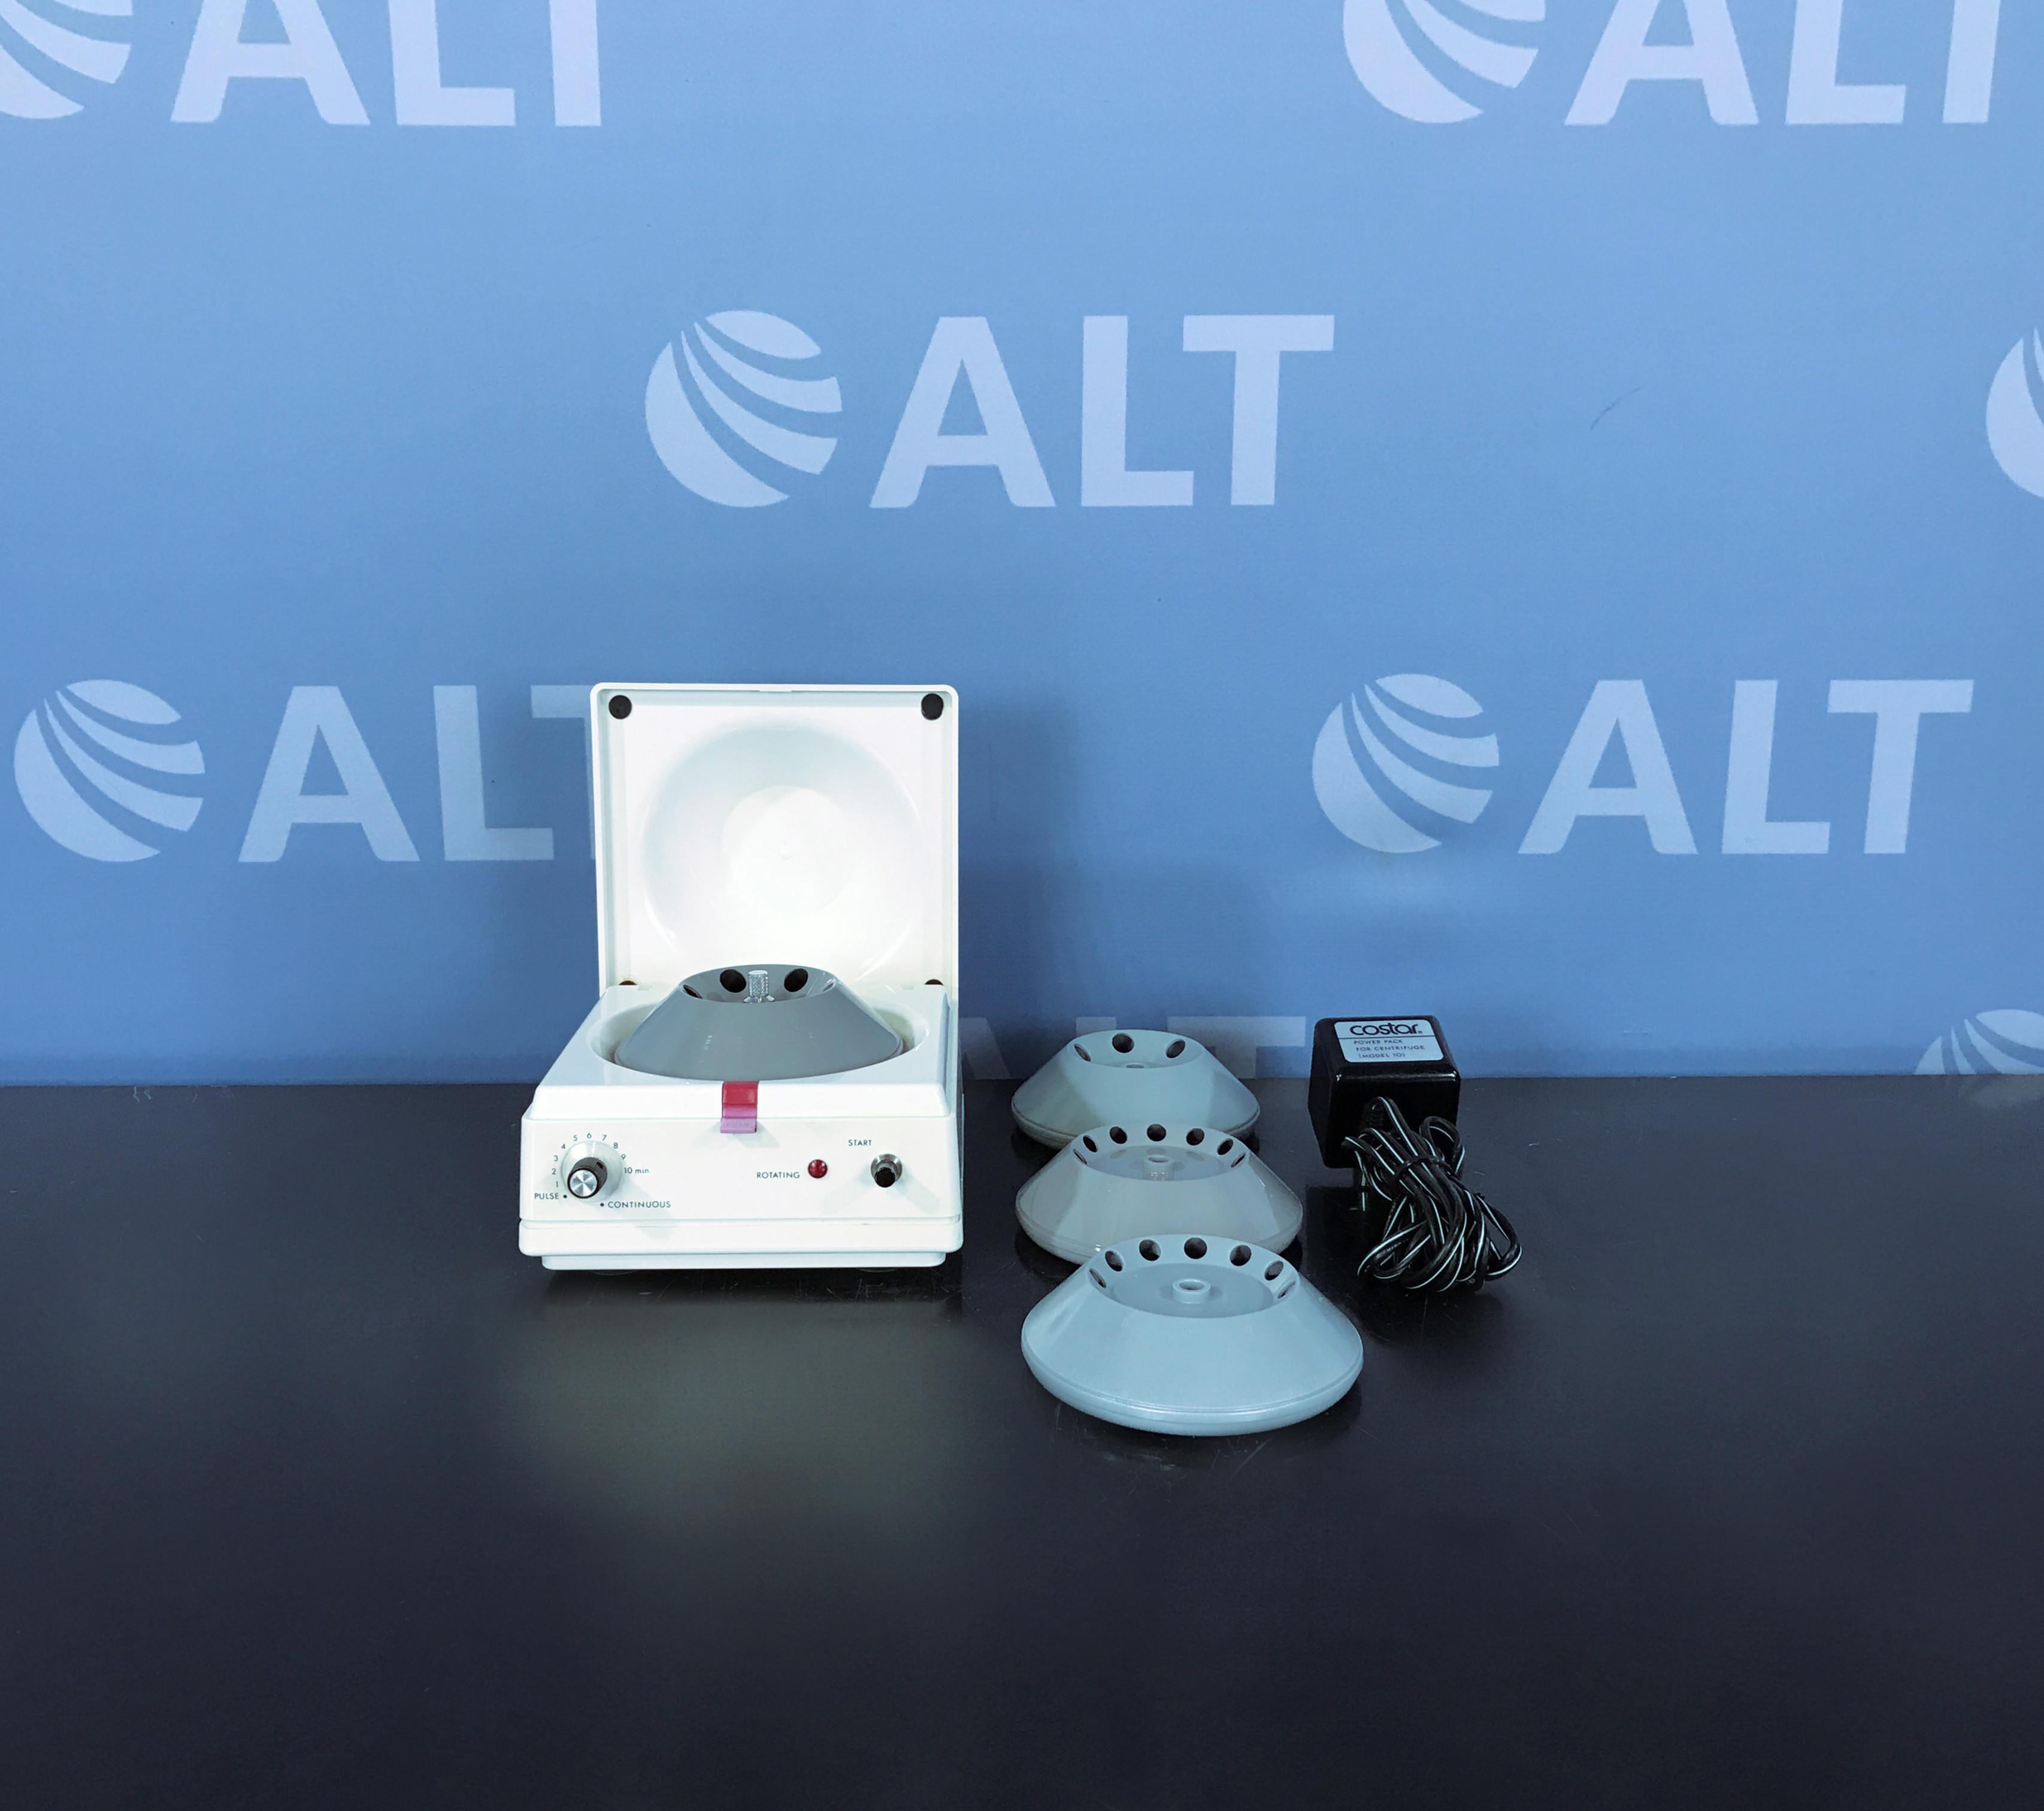 Costar Model 10 Mini Centrifuge Image